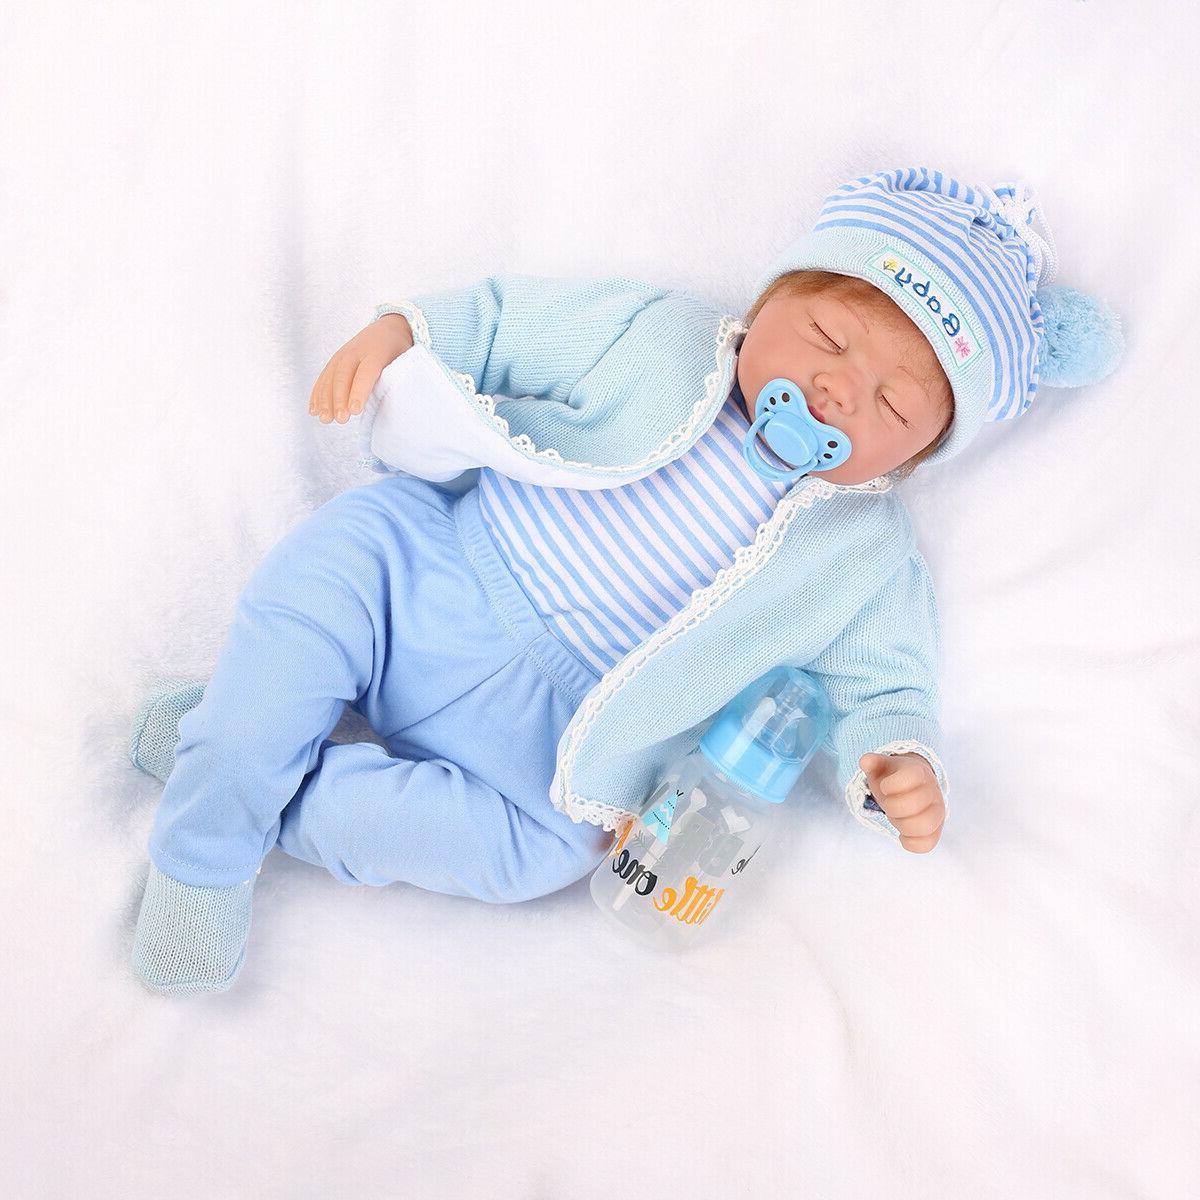 22 lifelike newborn silicone vinyl reborn gift